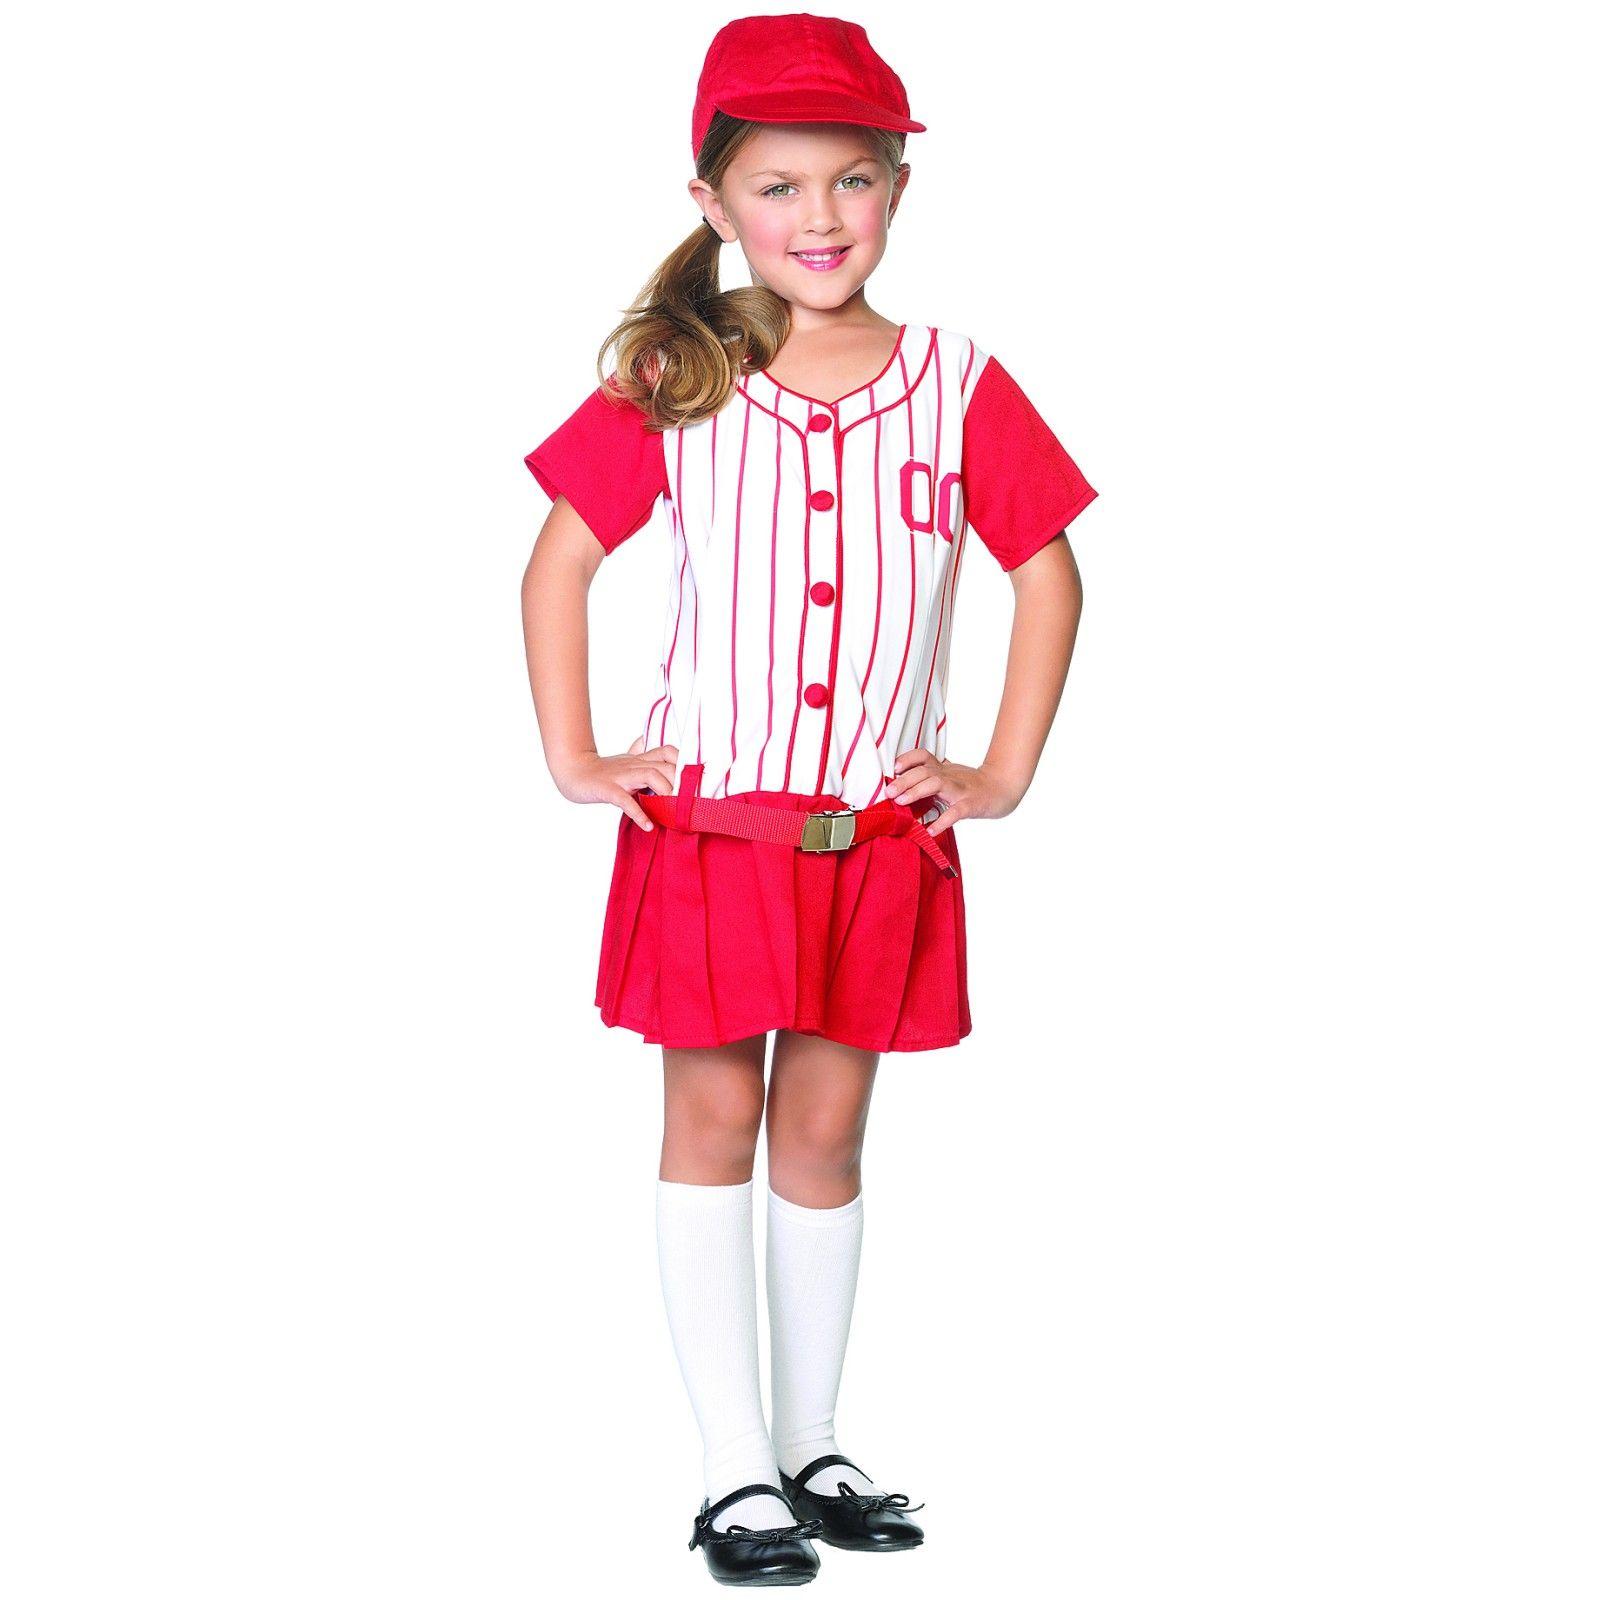 lil miss slugger child costume baseball halloween - Baseball Halloween Costume For Girls